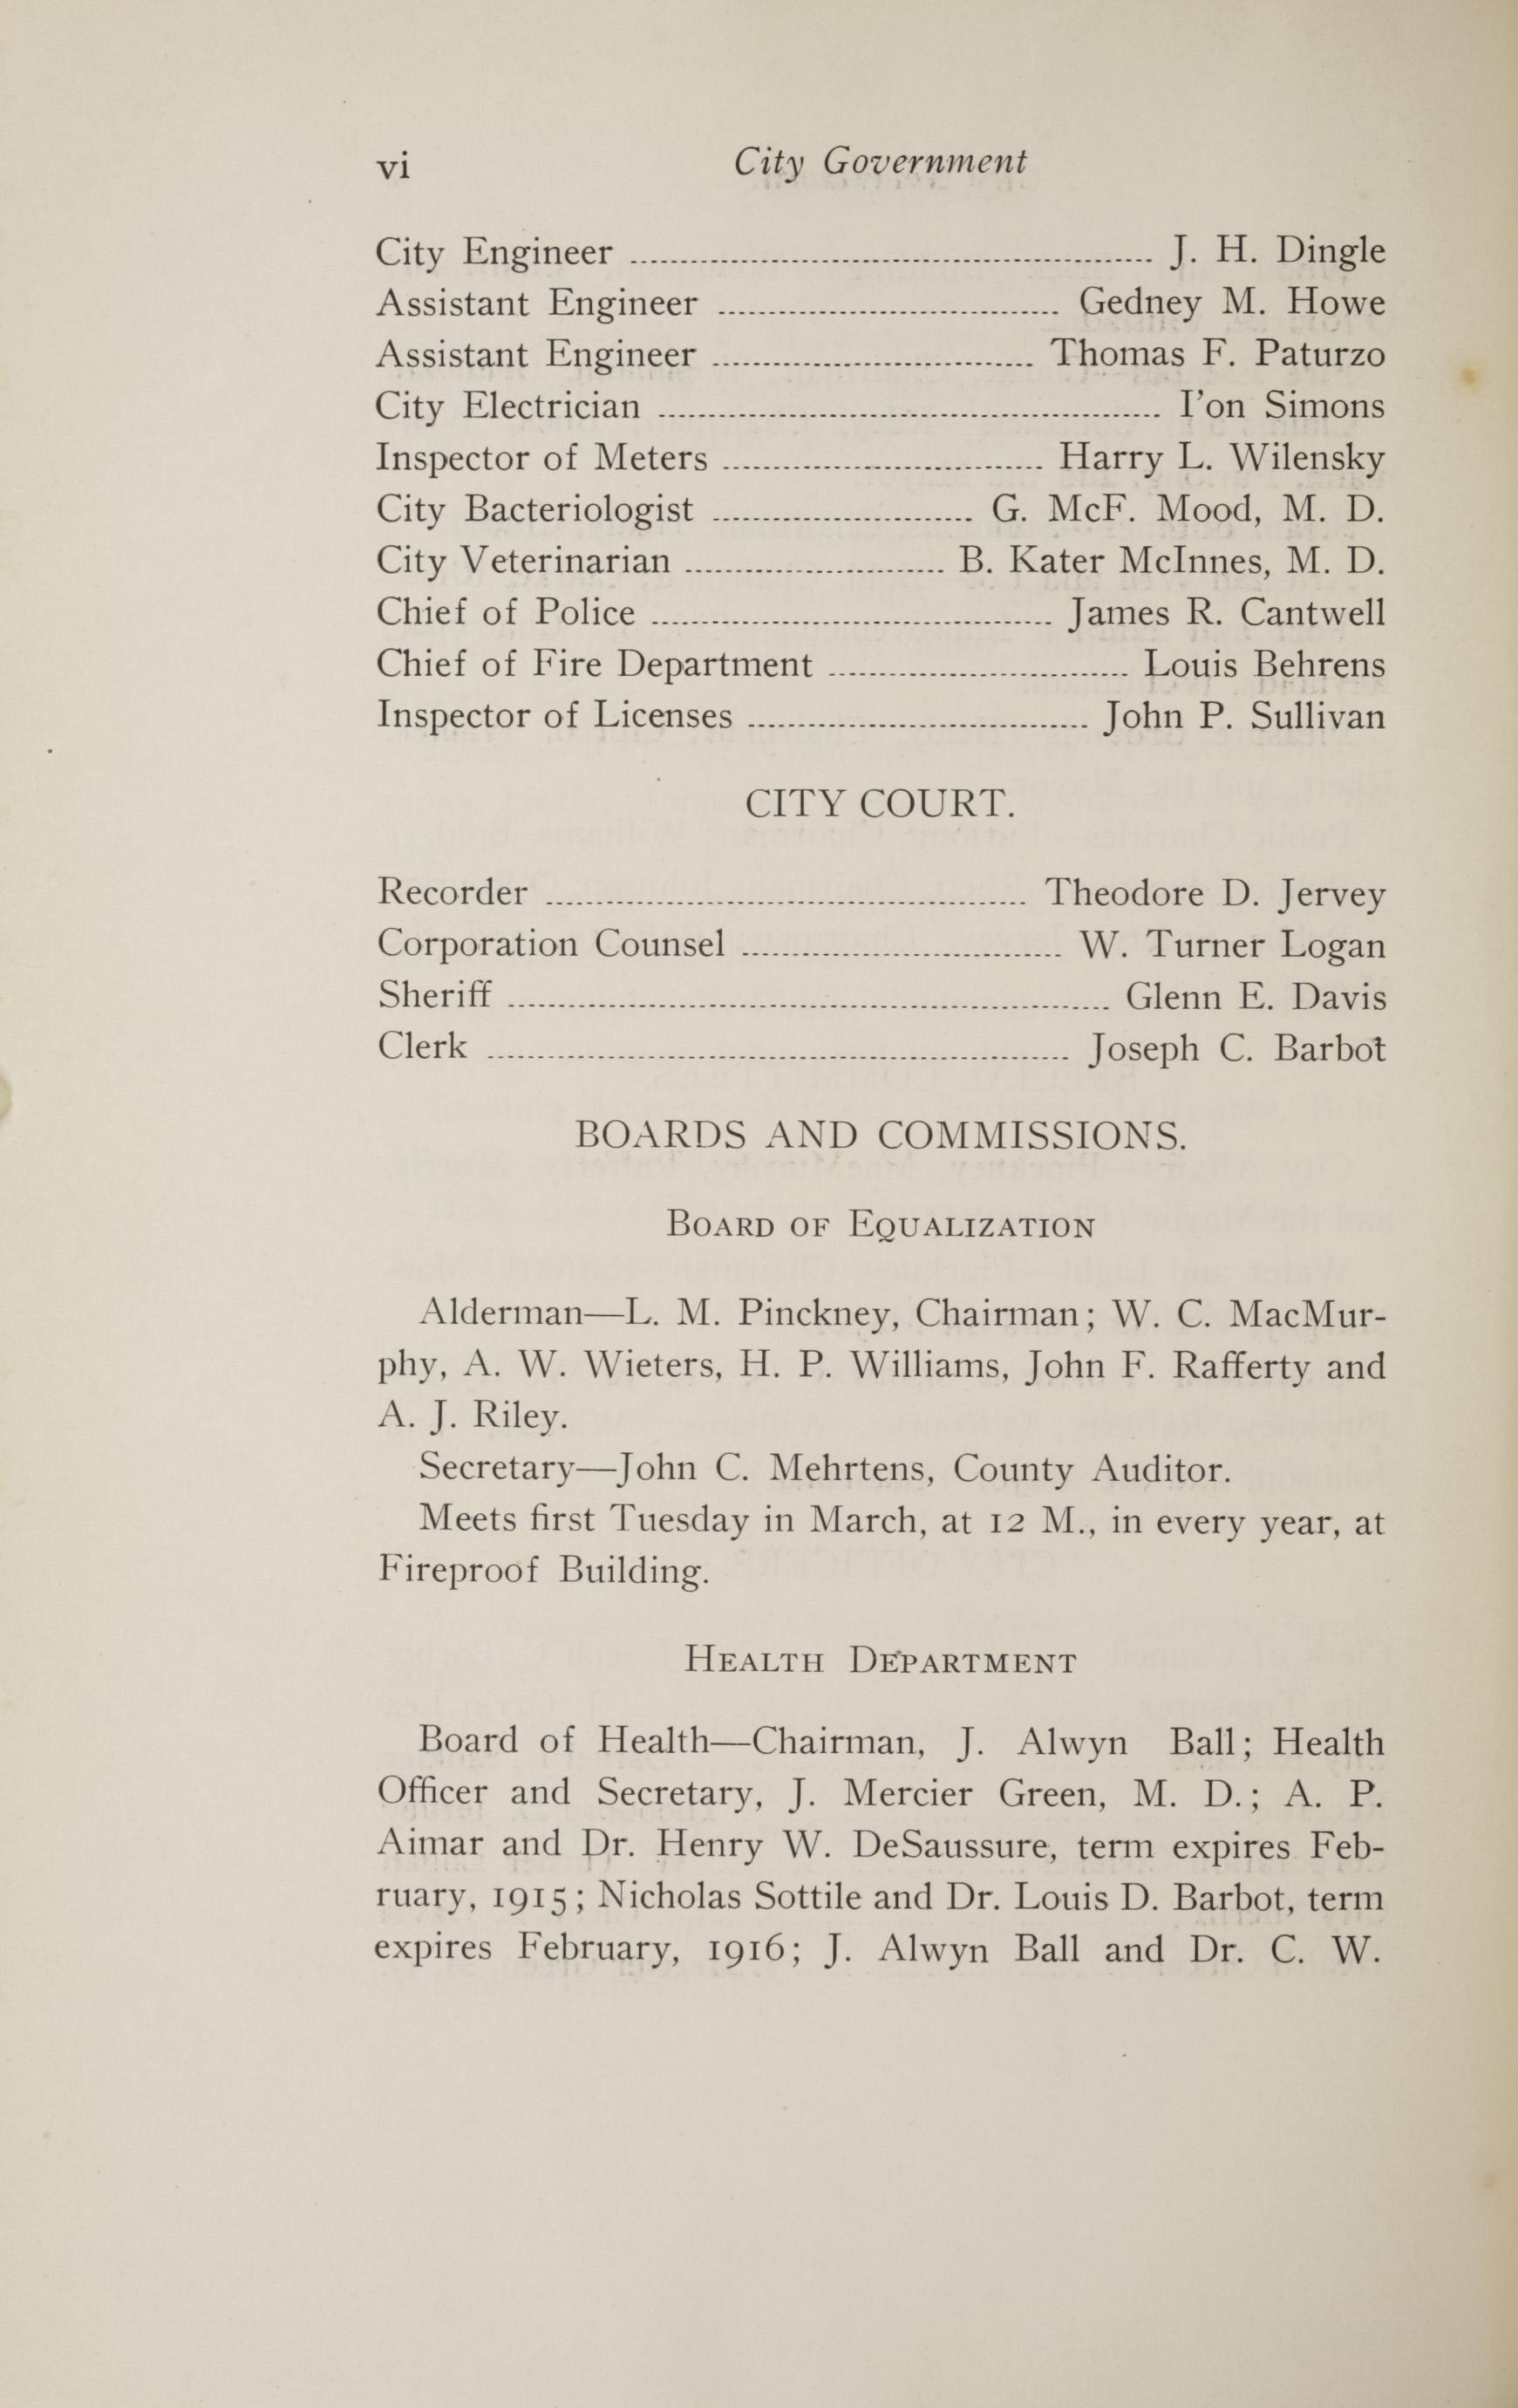 Charleston Yearbook, 1914, page vi